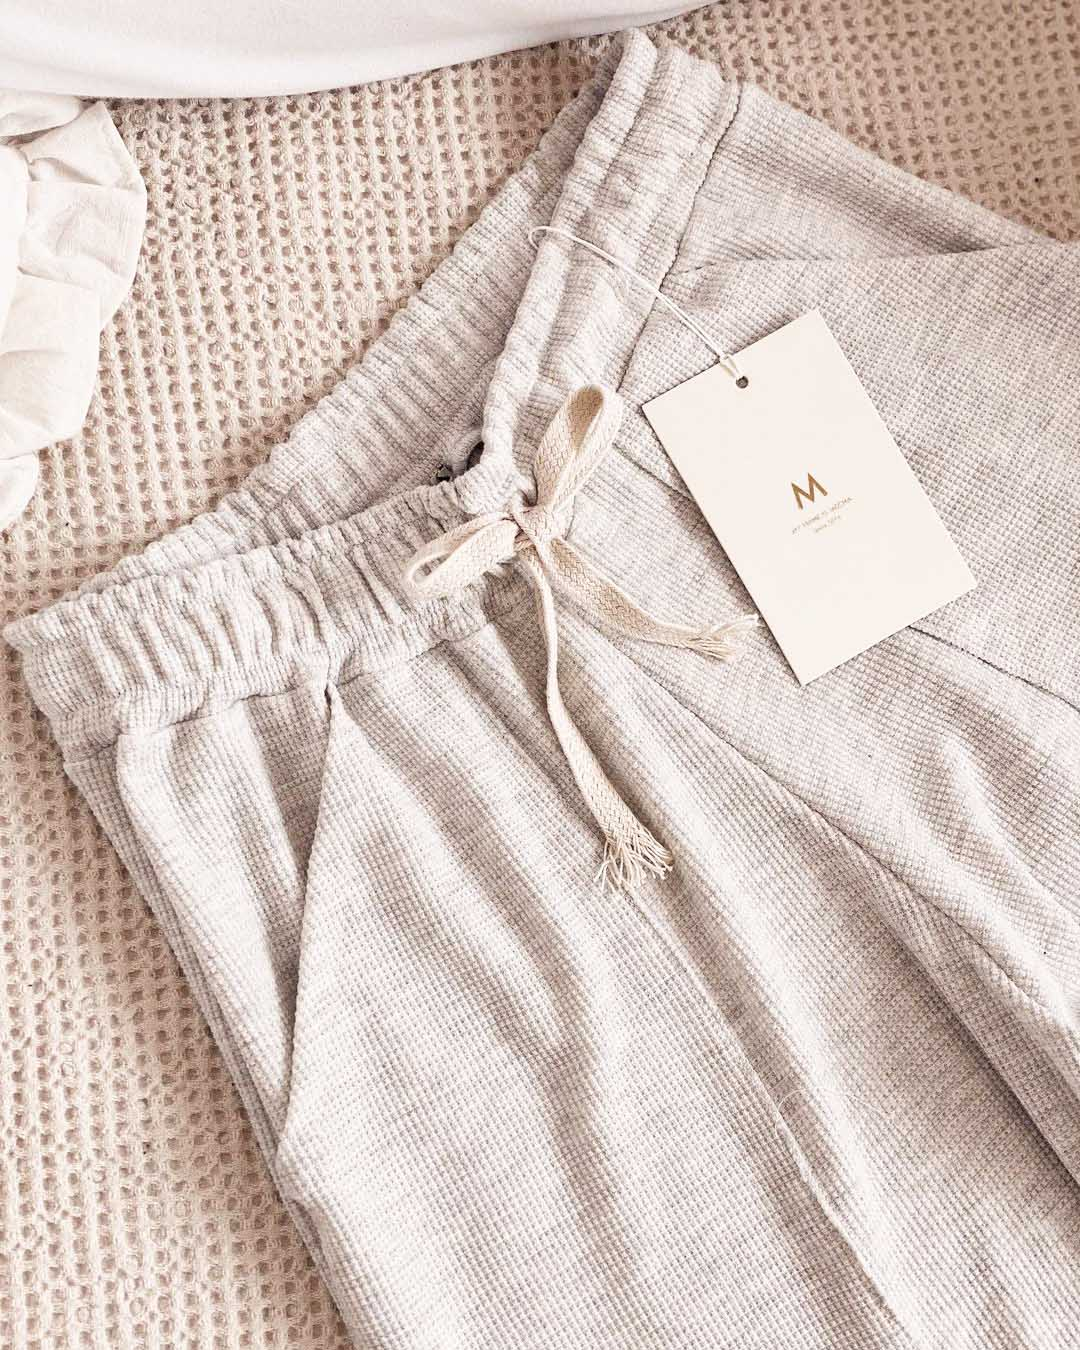 pantalon invierno 2021 moda mujer ropa de moda 2021